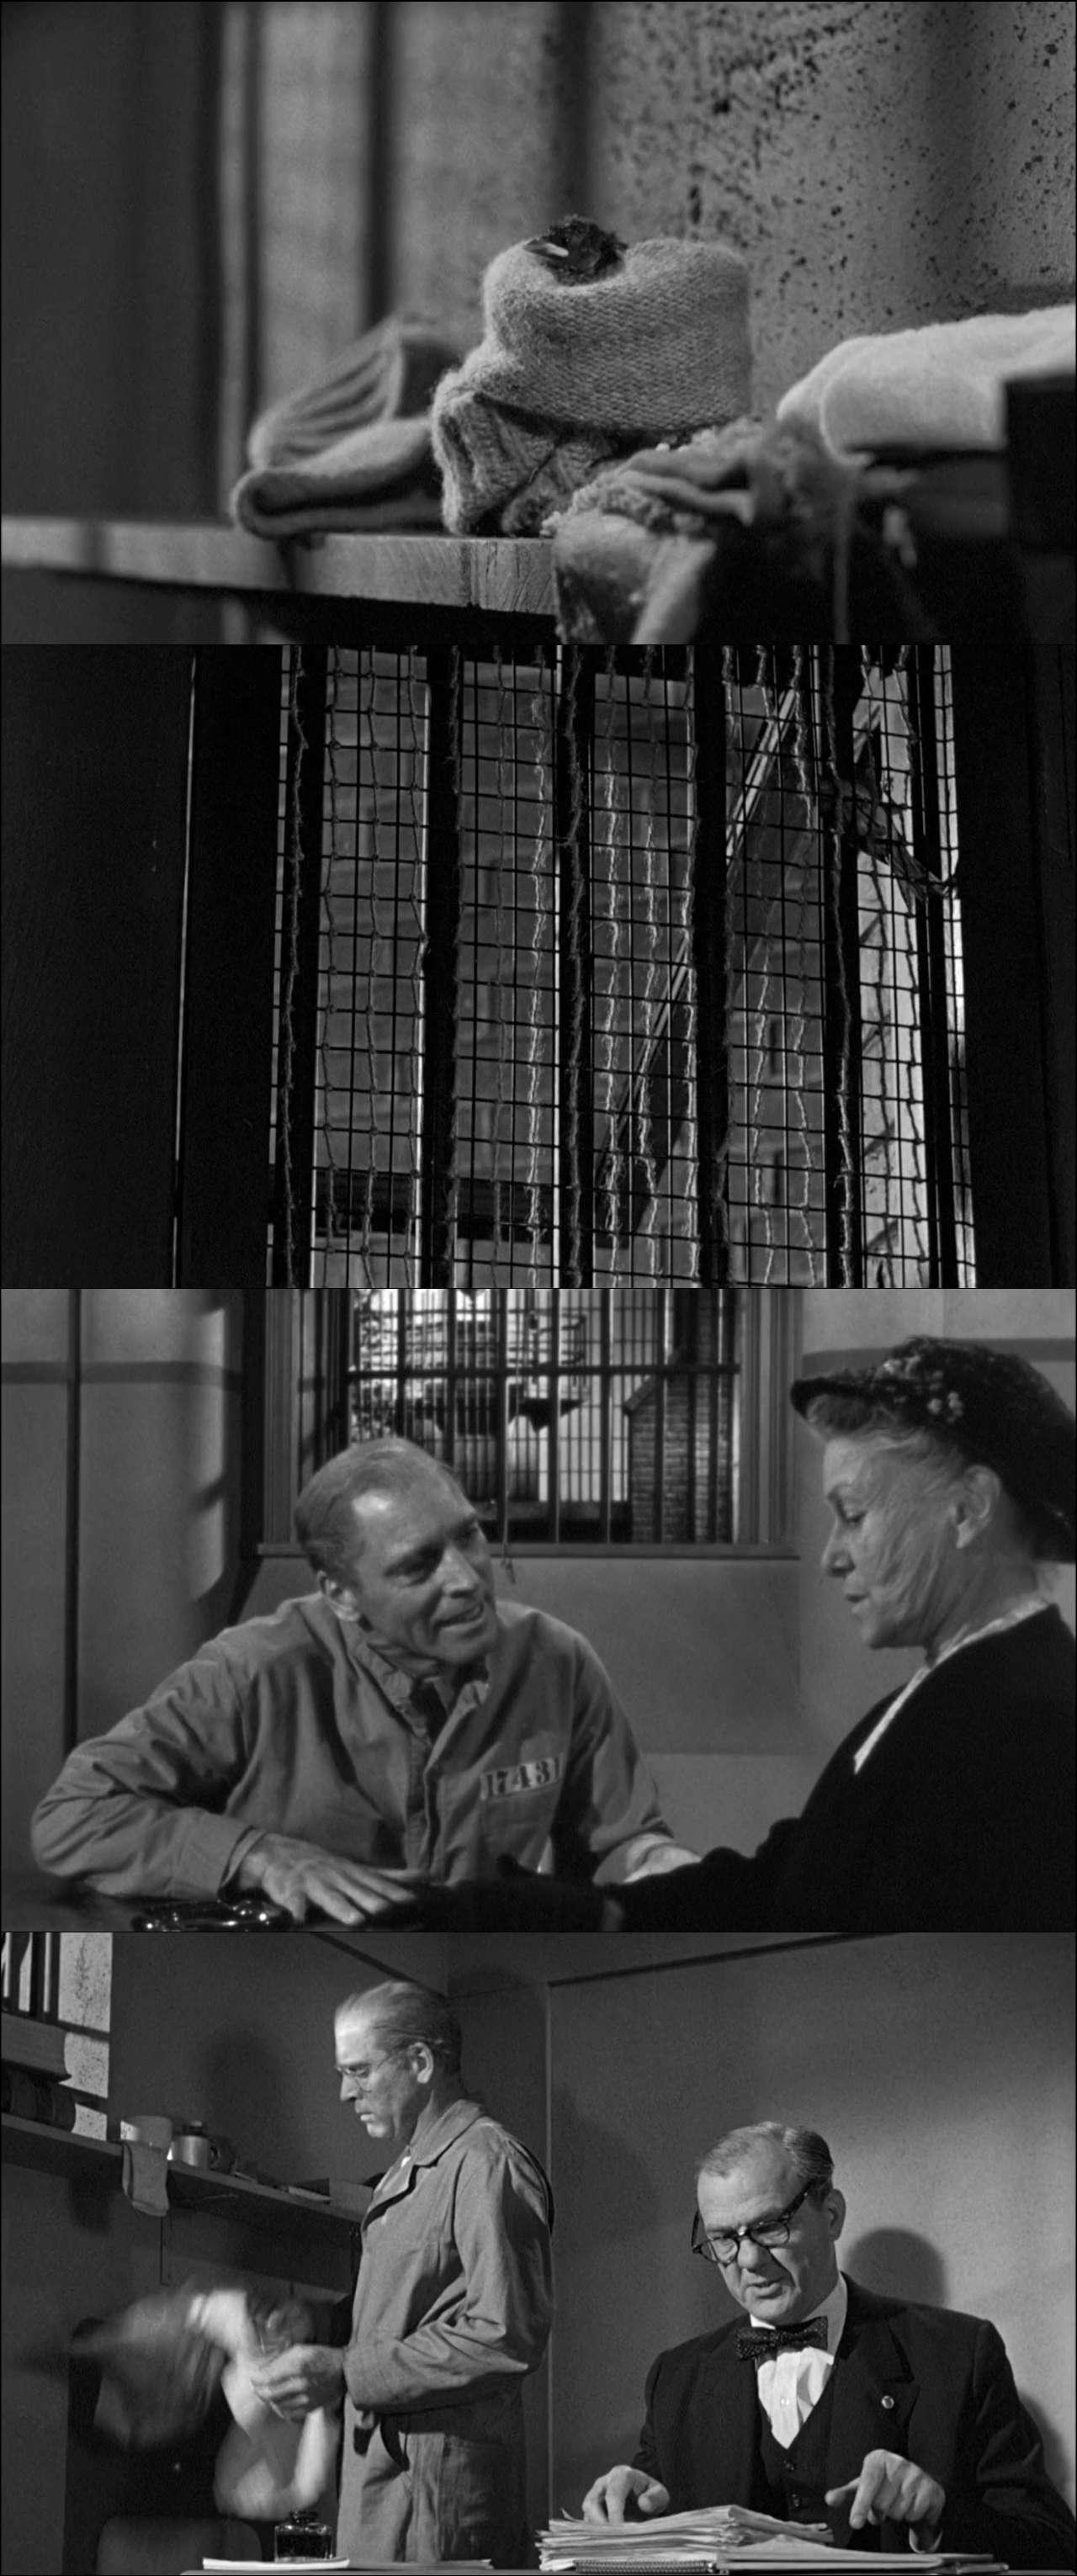 Alkatraz Kuşçusu - Birdman of Alcatraz (1962) türkçe dublaj film indir